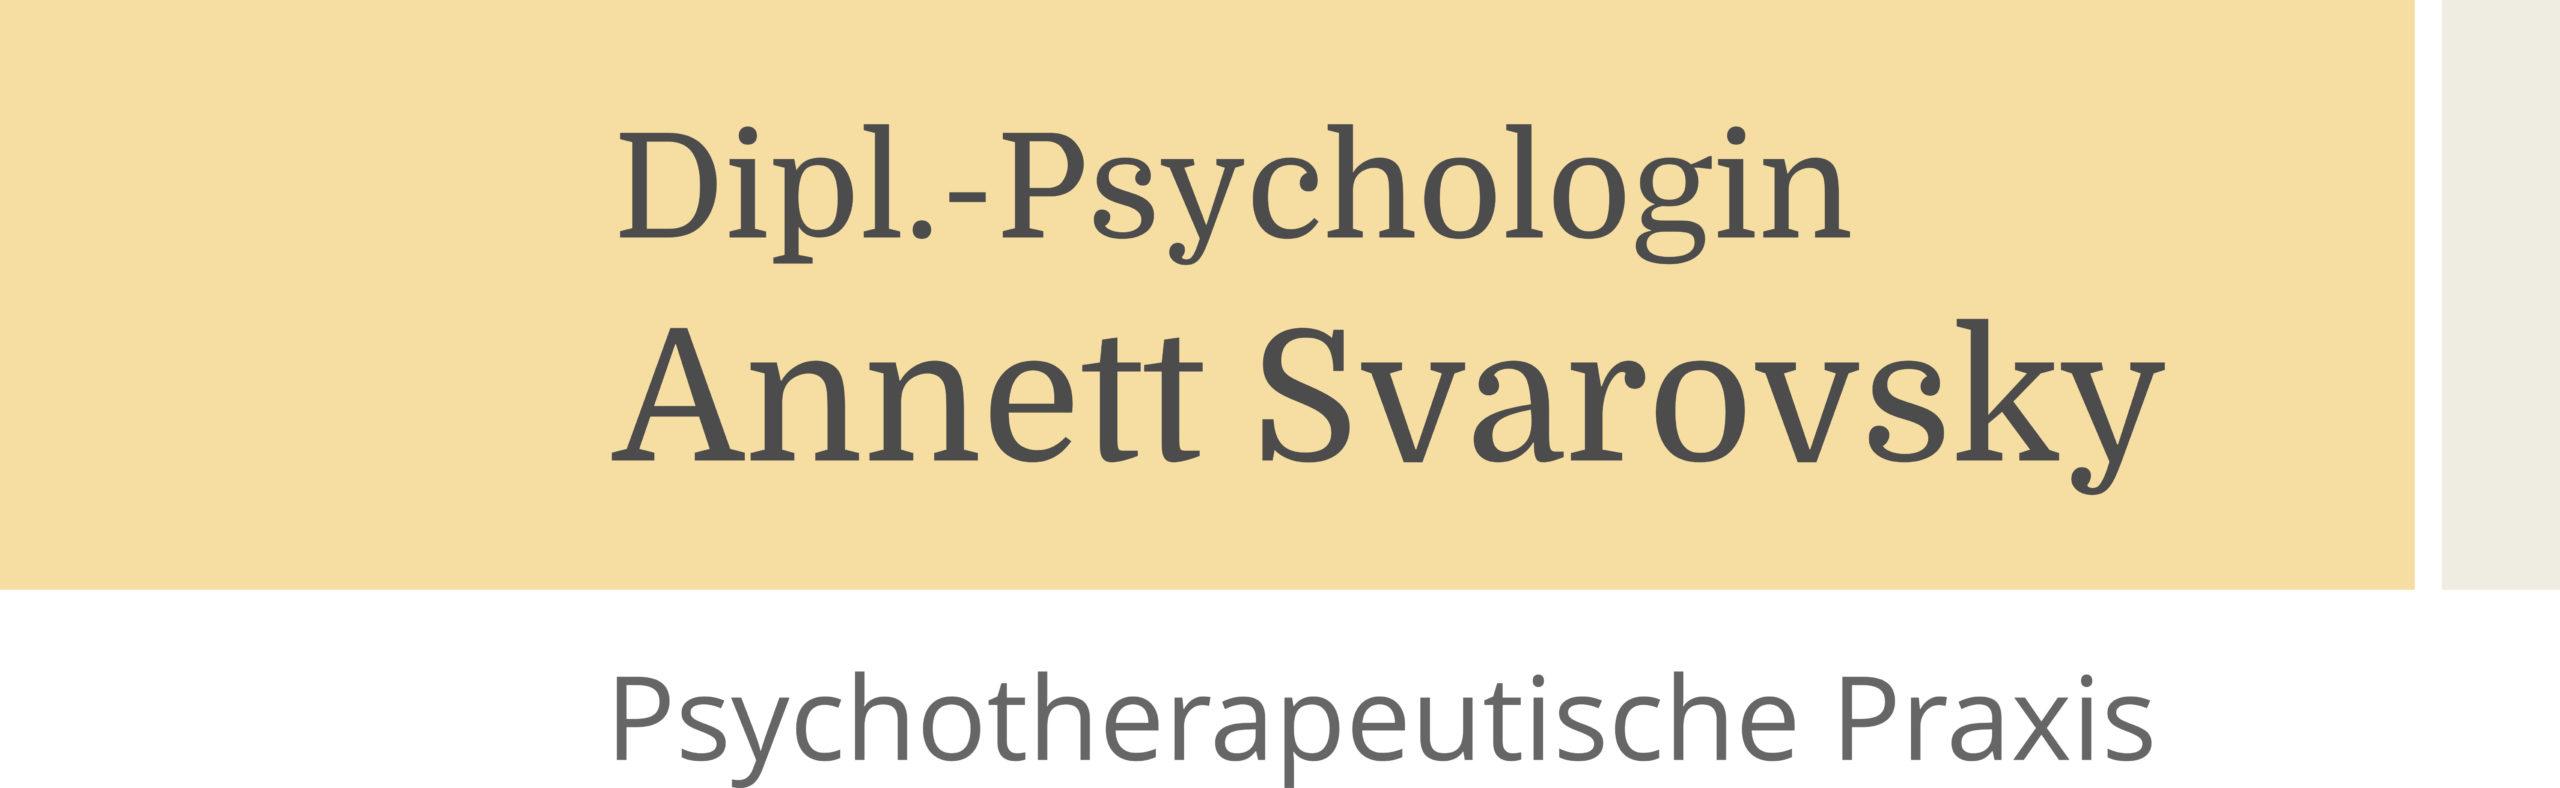 Psychotherapie Praxis Leipzig Dipl.-Psych. A.Svarovsky